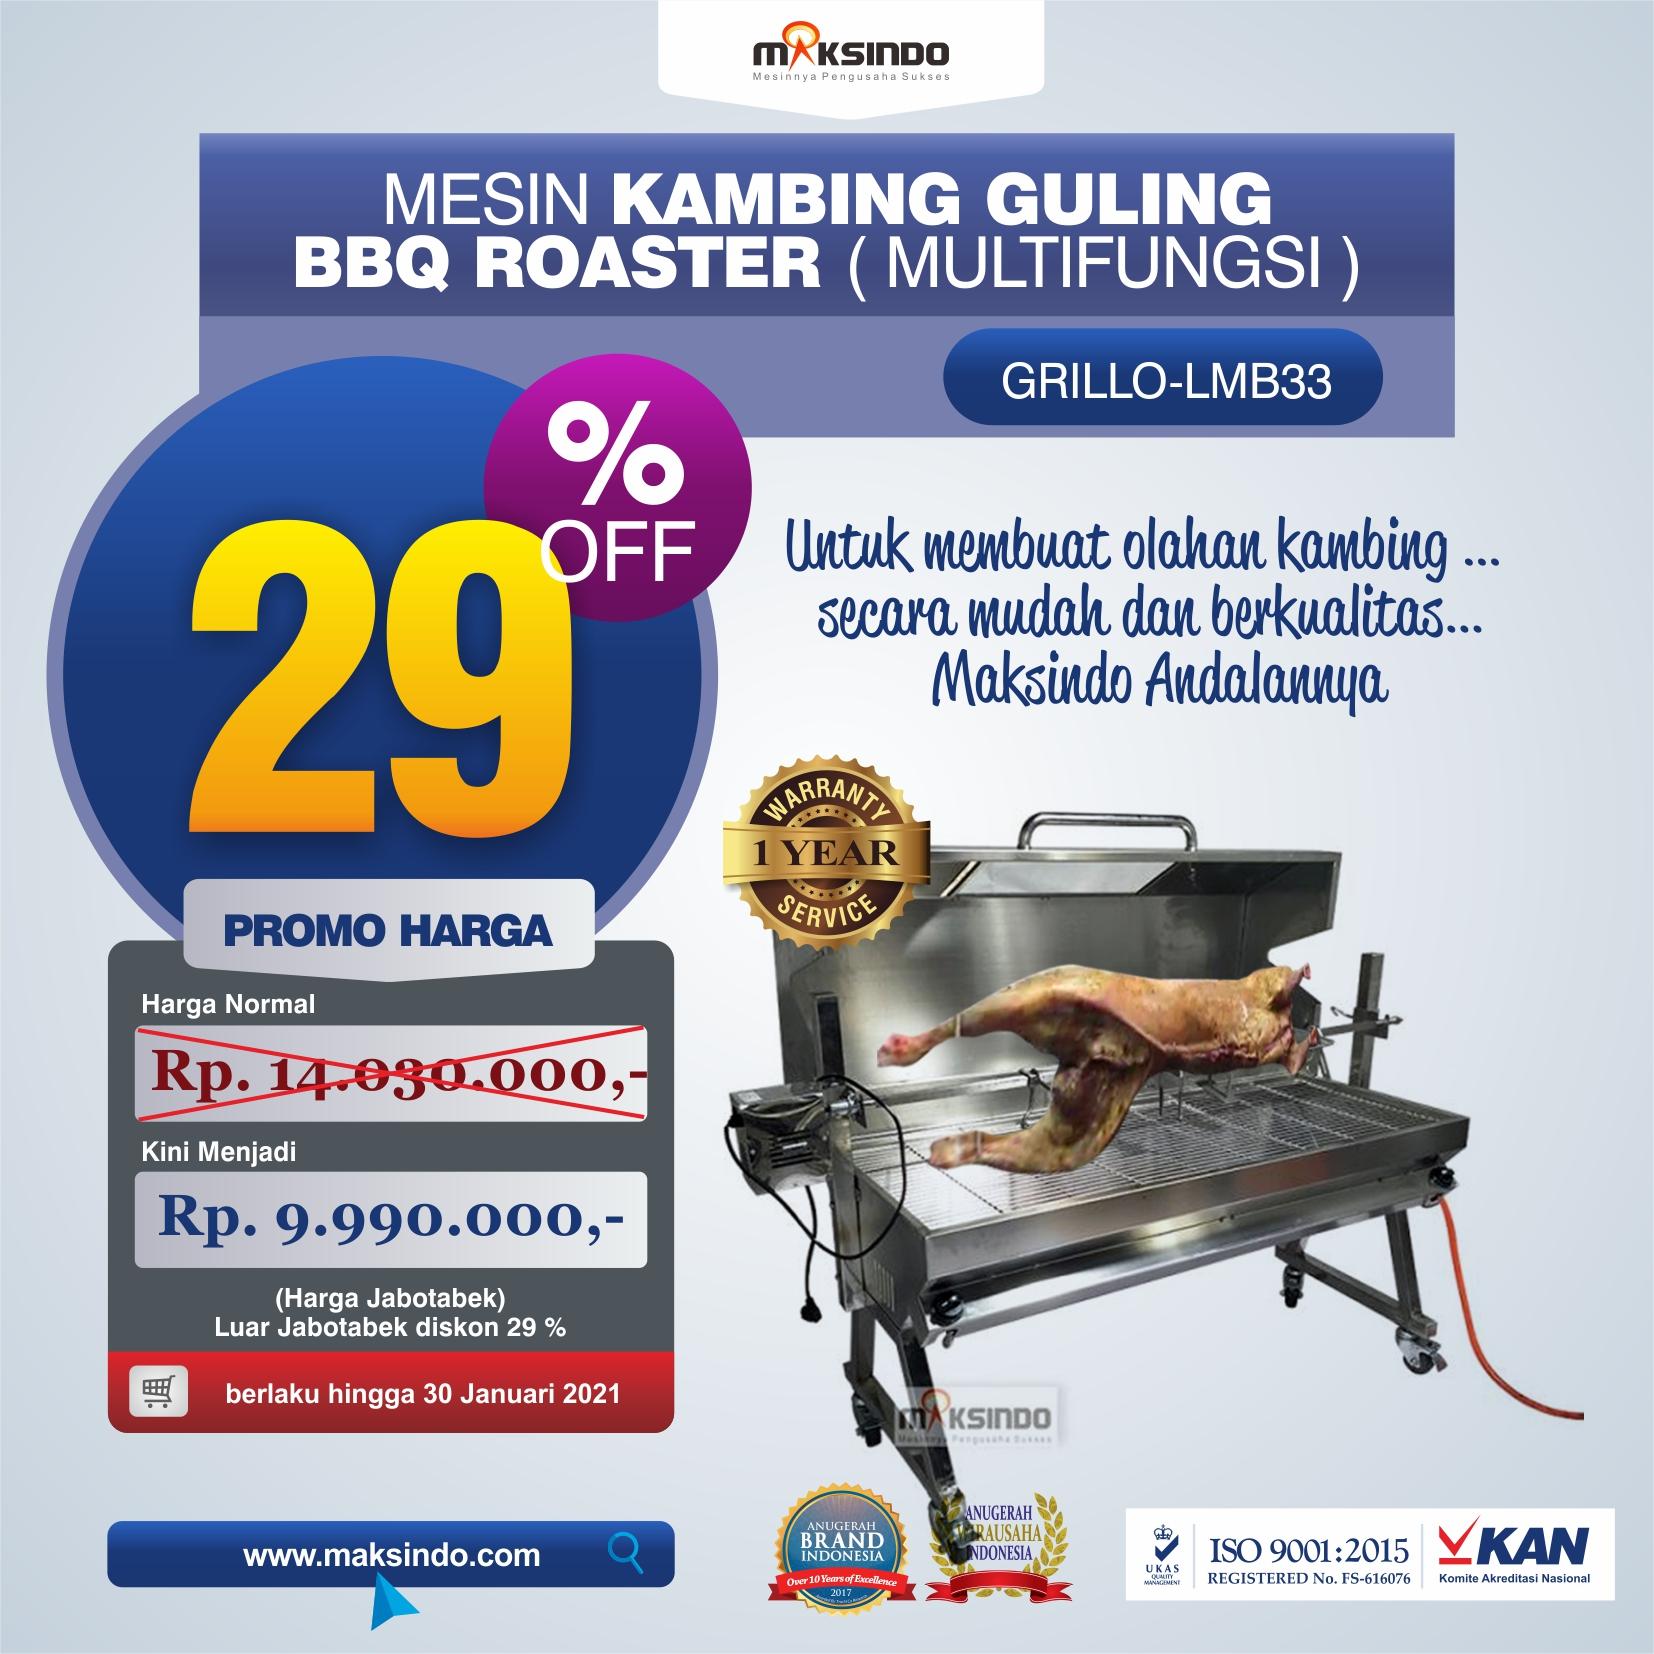 Jual Mesin Kambing Guling BBQ Roaster (GRILLO-LMB33) di Tangerang